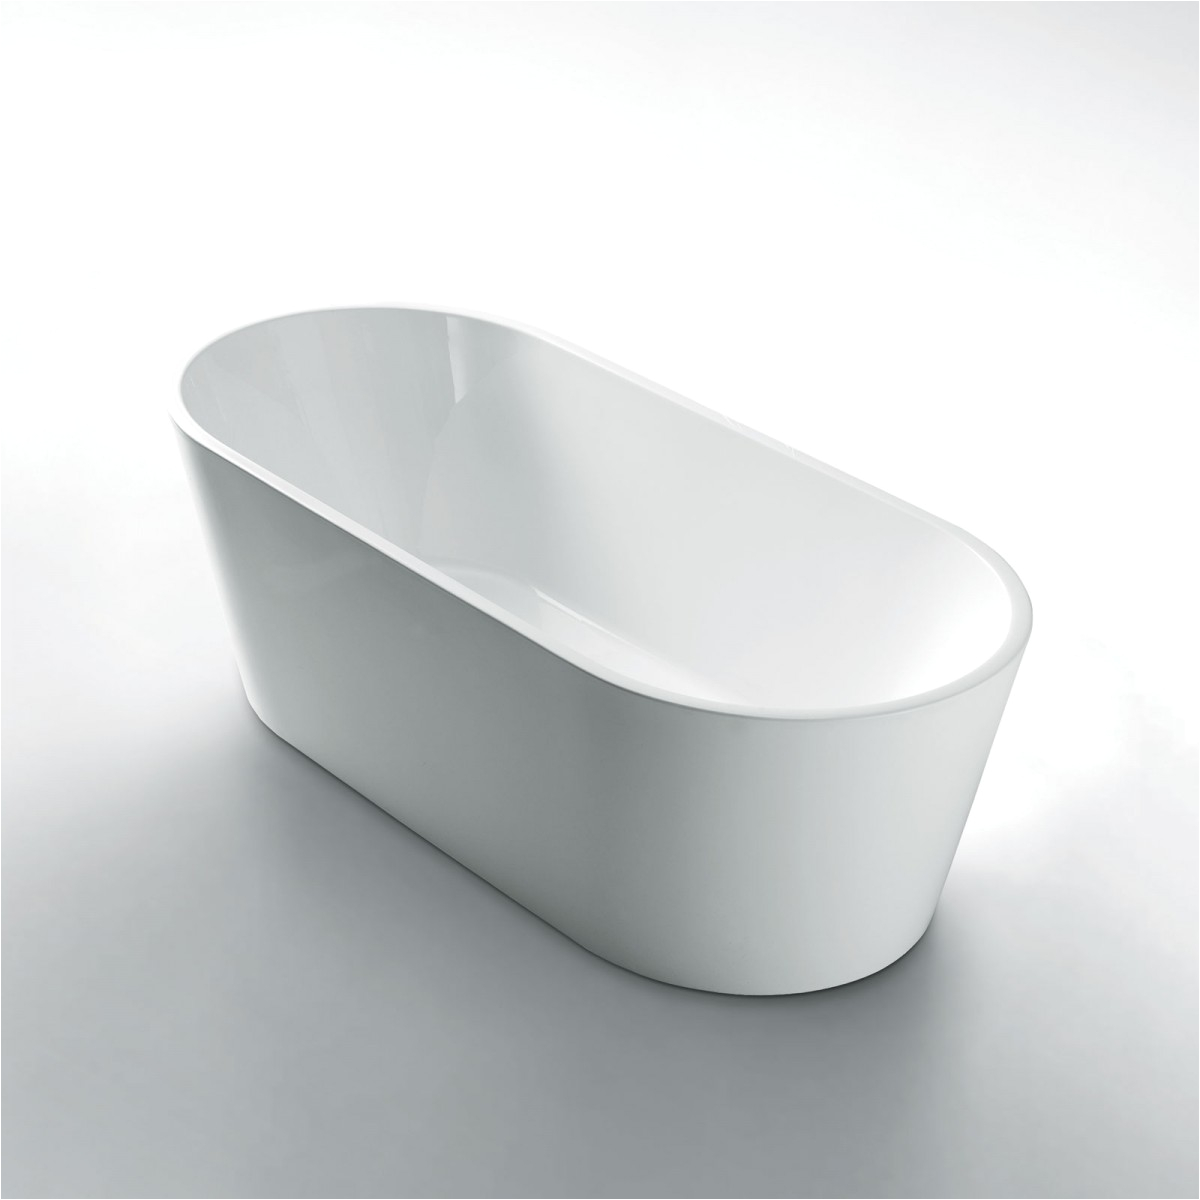 aspen 1500mm oval free standing bath